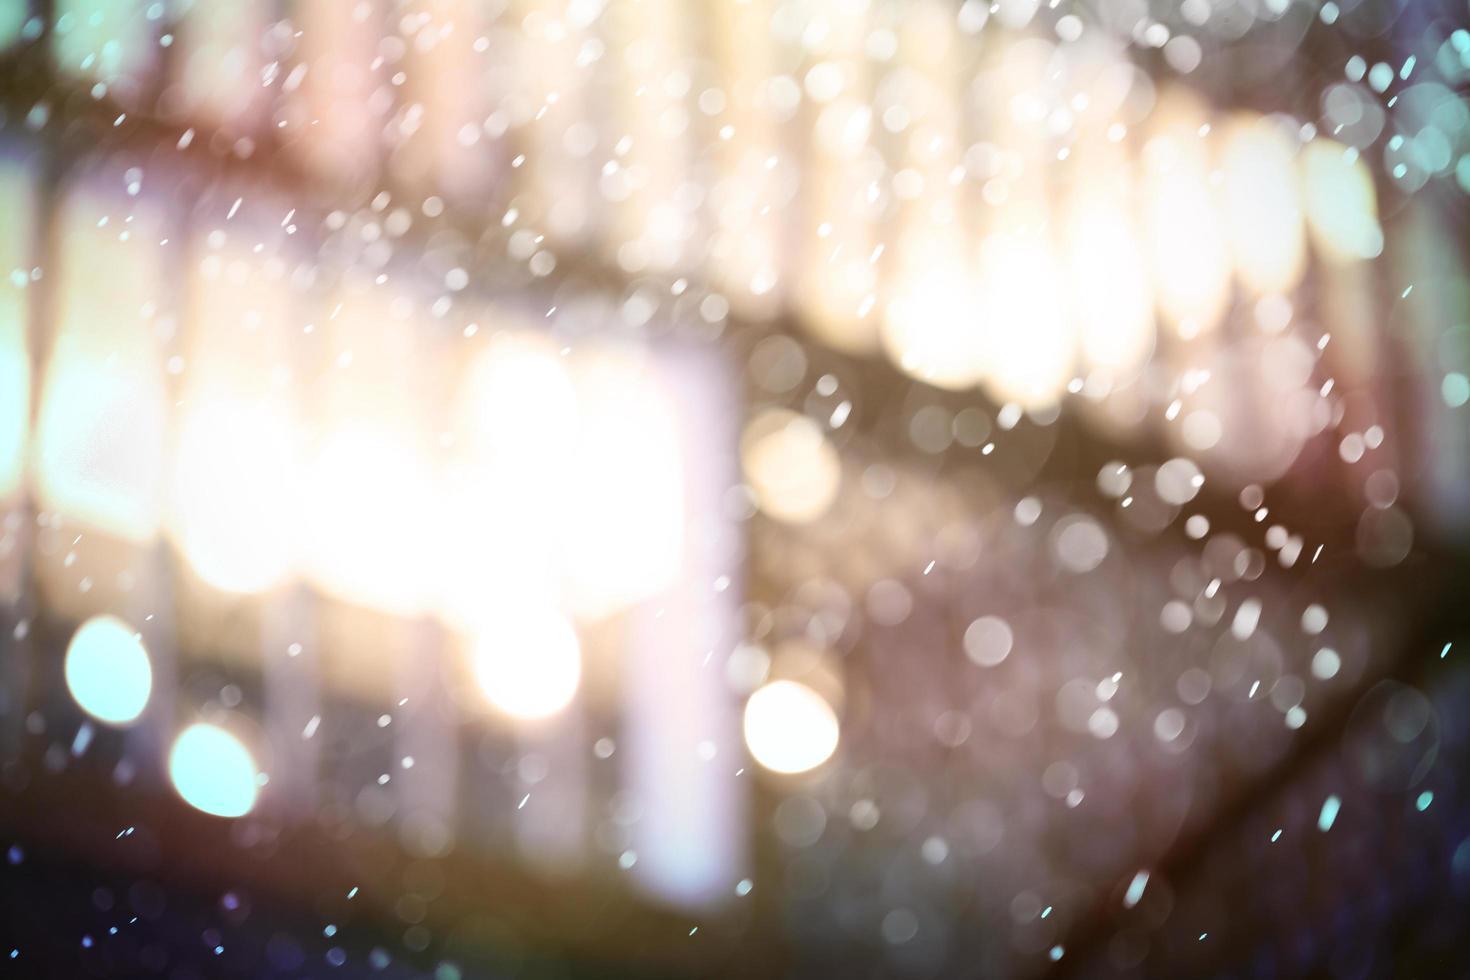 Rainy window bokeh photo